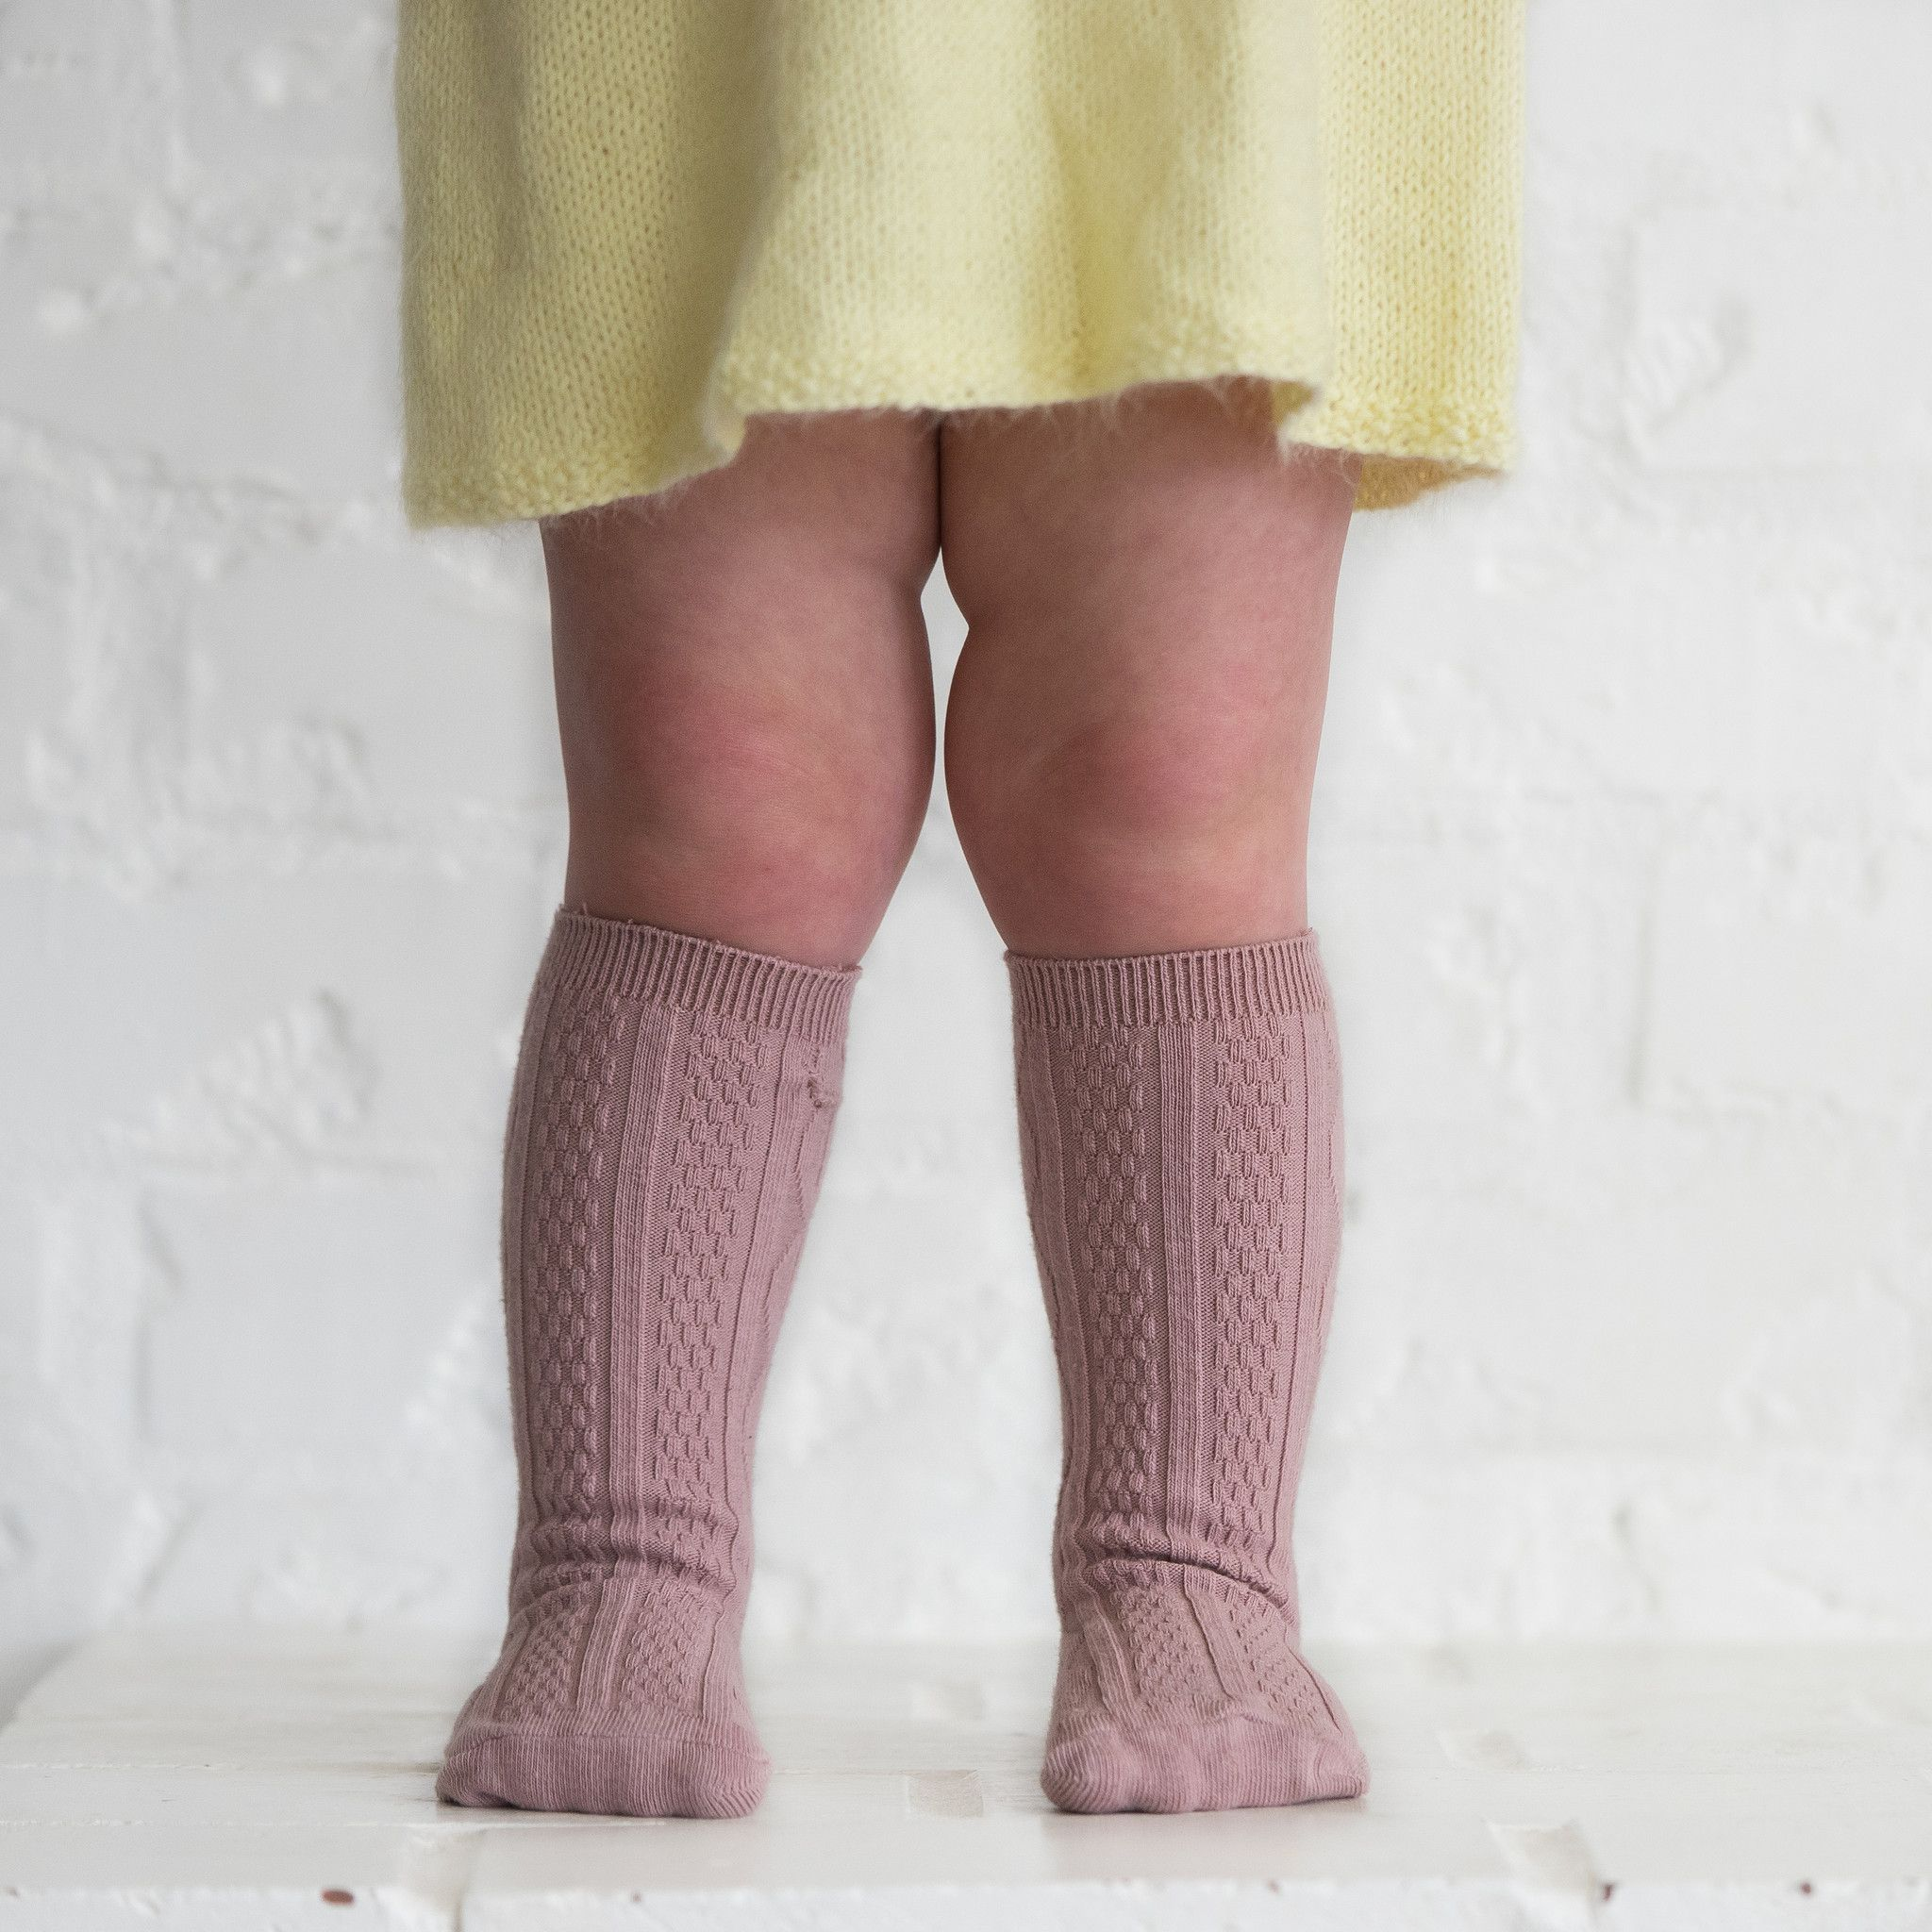 Dusty Pink Knee High Socks Kaia Jade Otake Pinterest